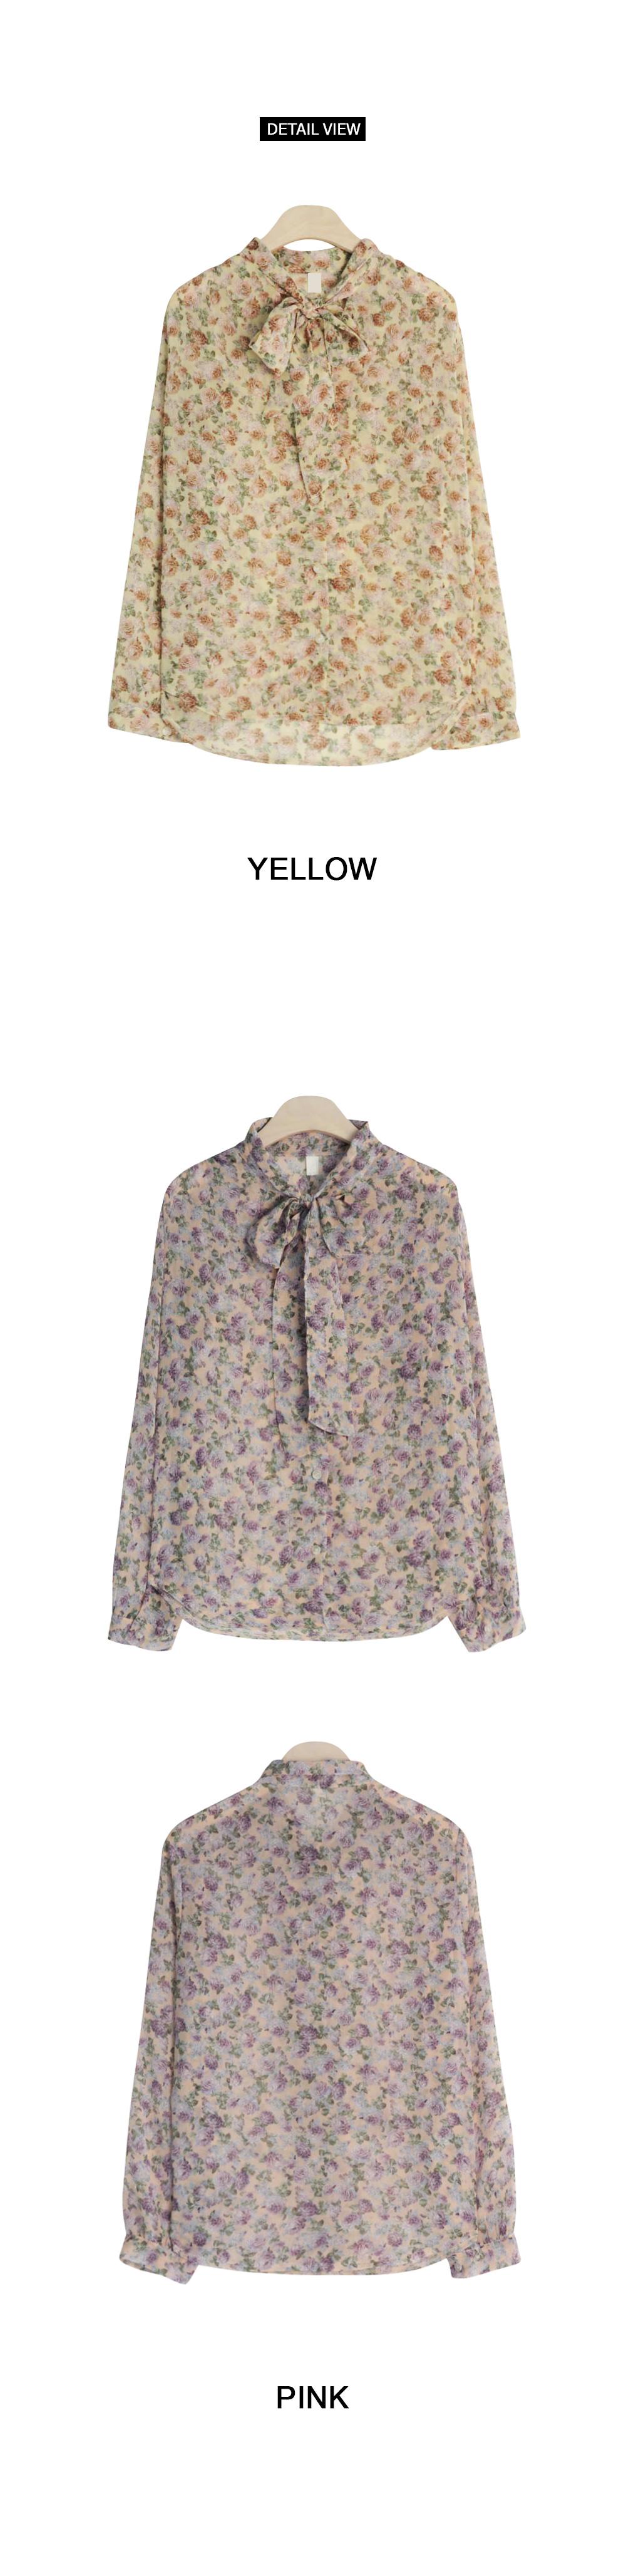 Chiffon vintage rose blouse